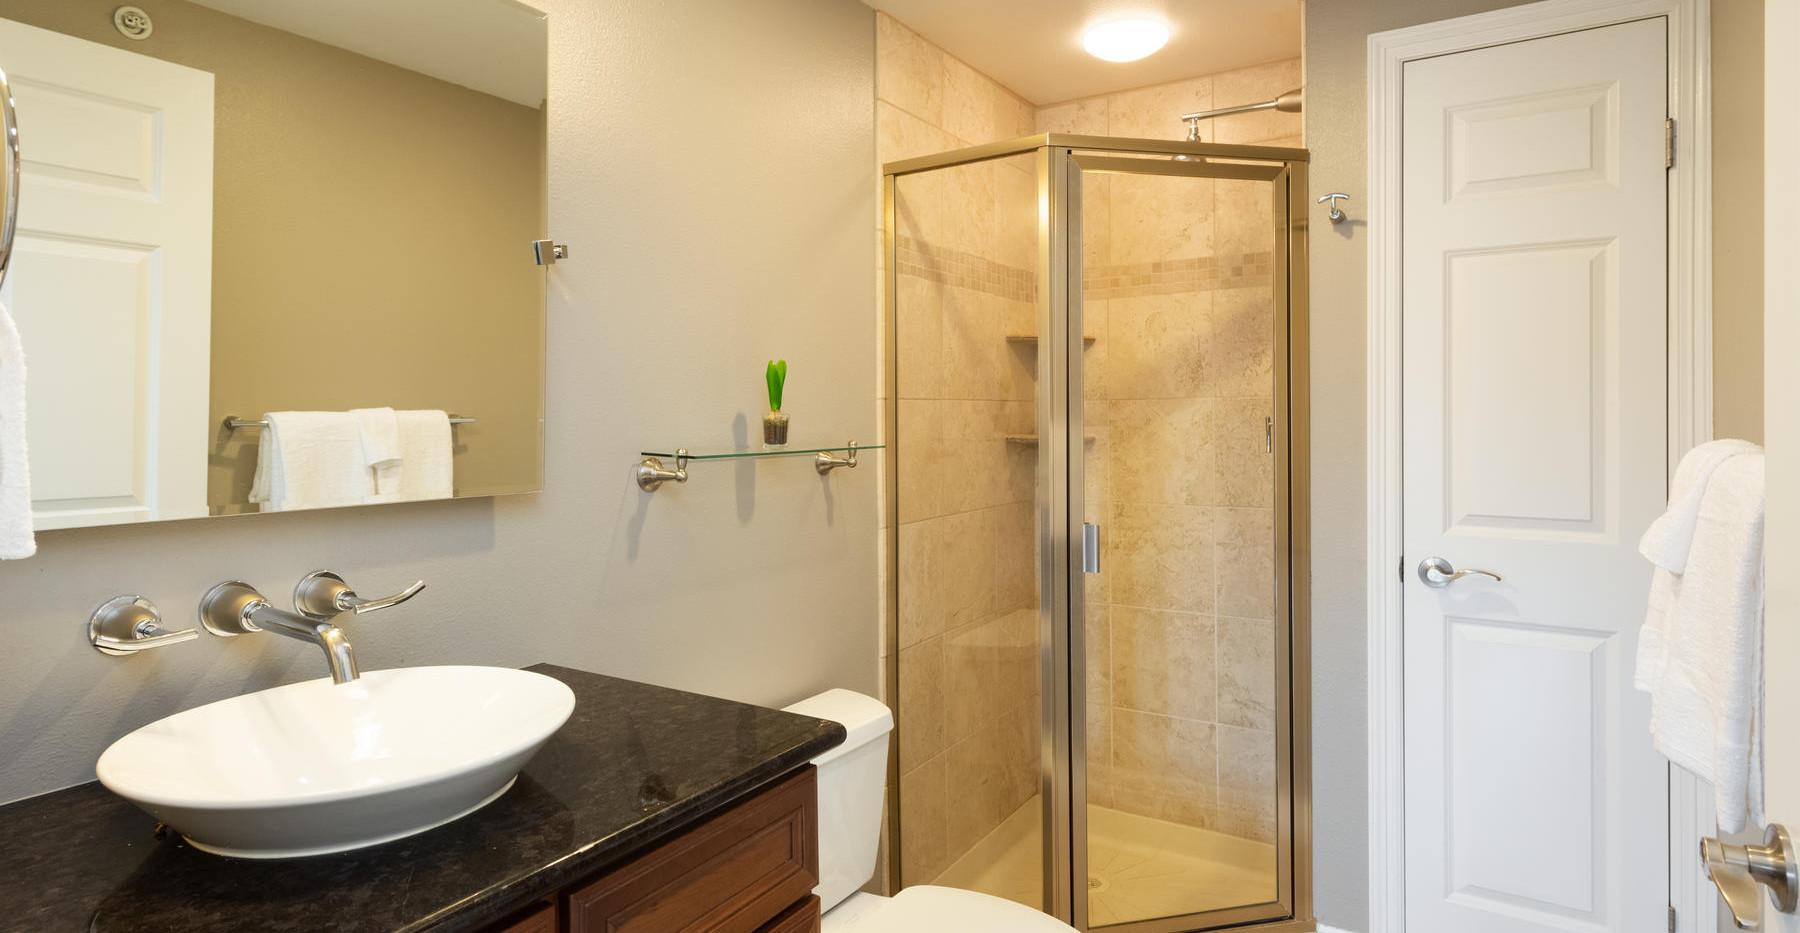 920 E 17th Avenue-062-060-Bathroom-MLS_S